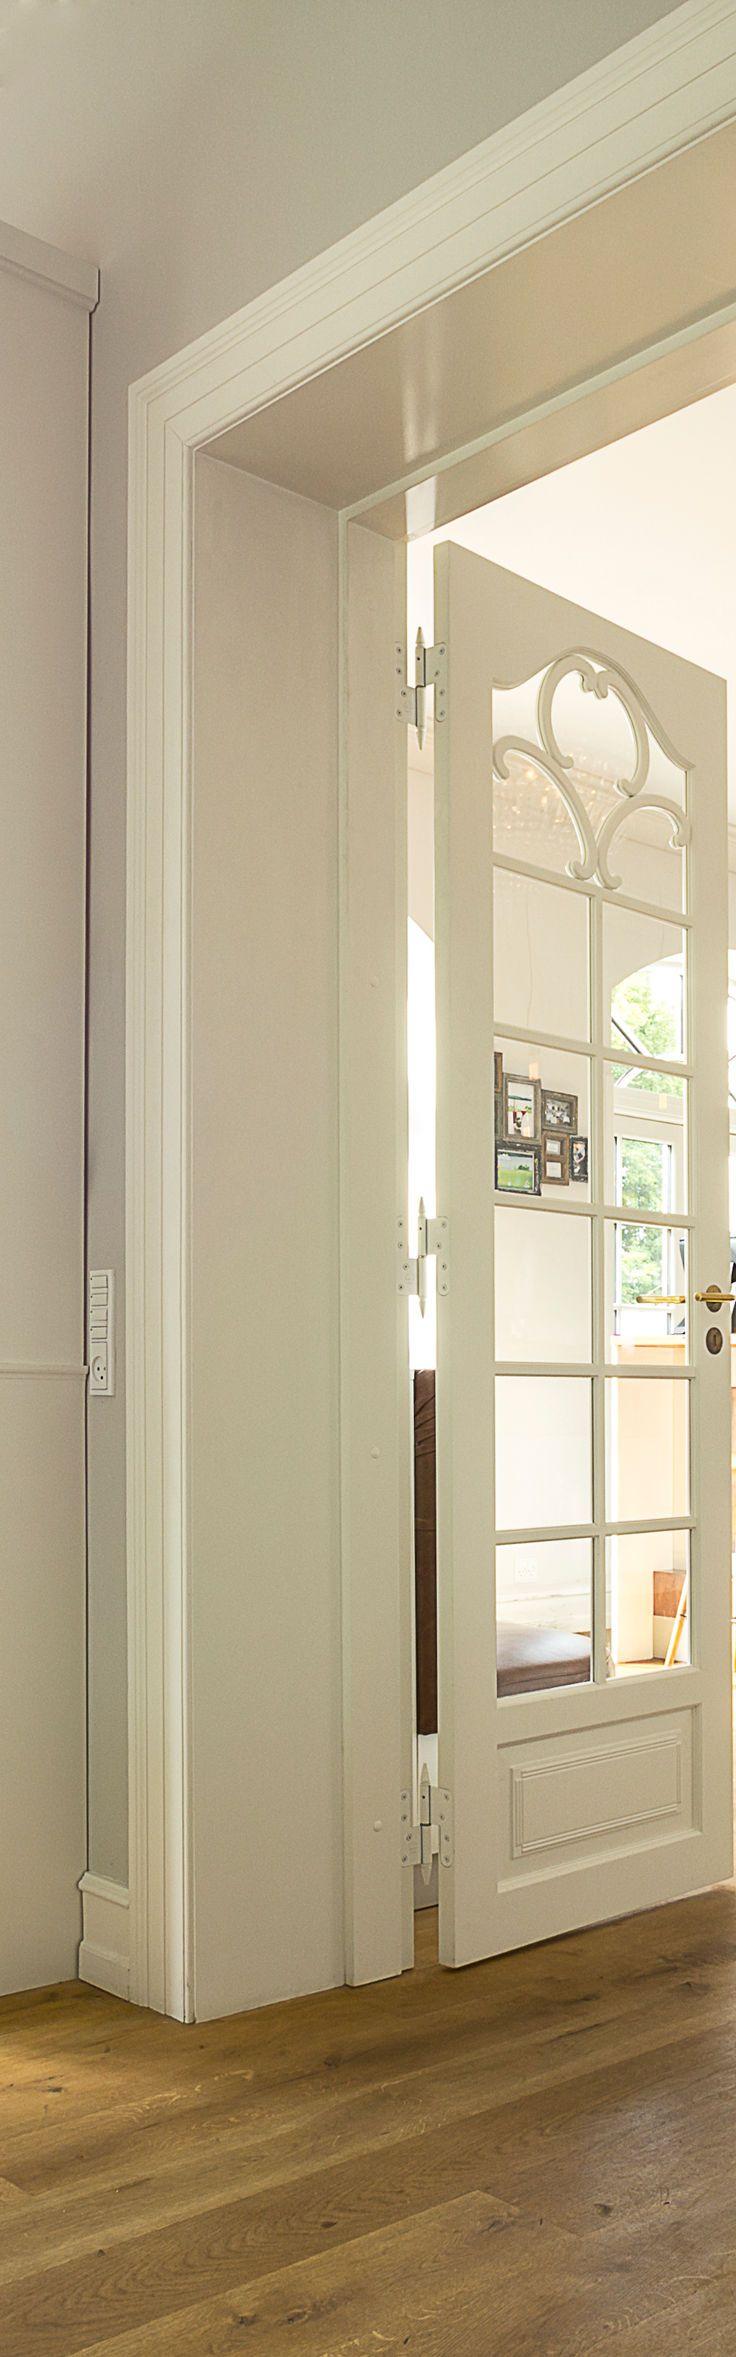 French Door | interior in Stella Maris, Svendborg